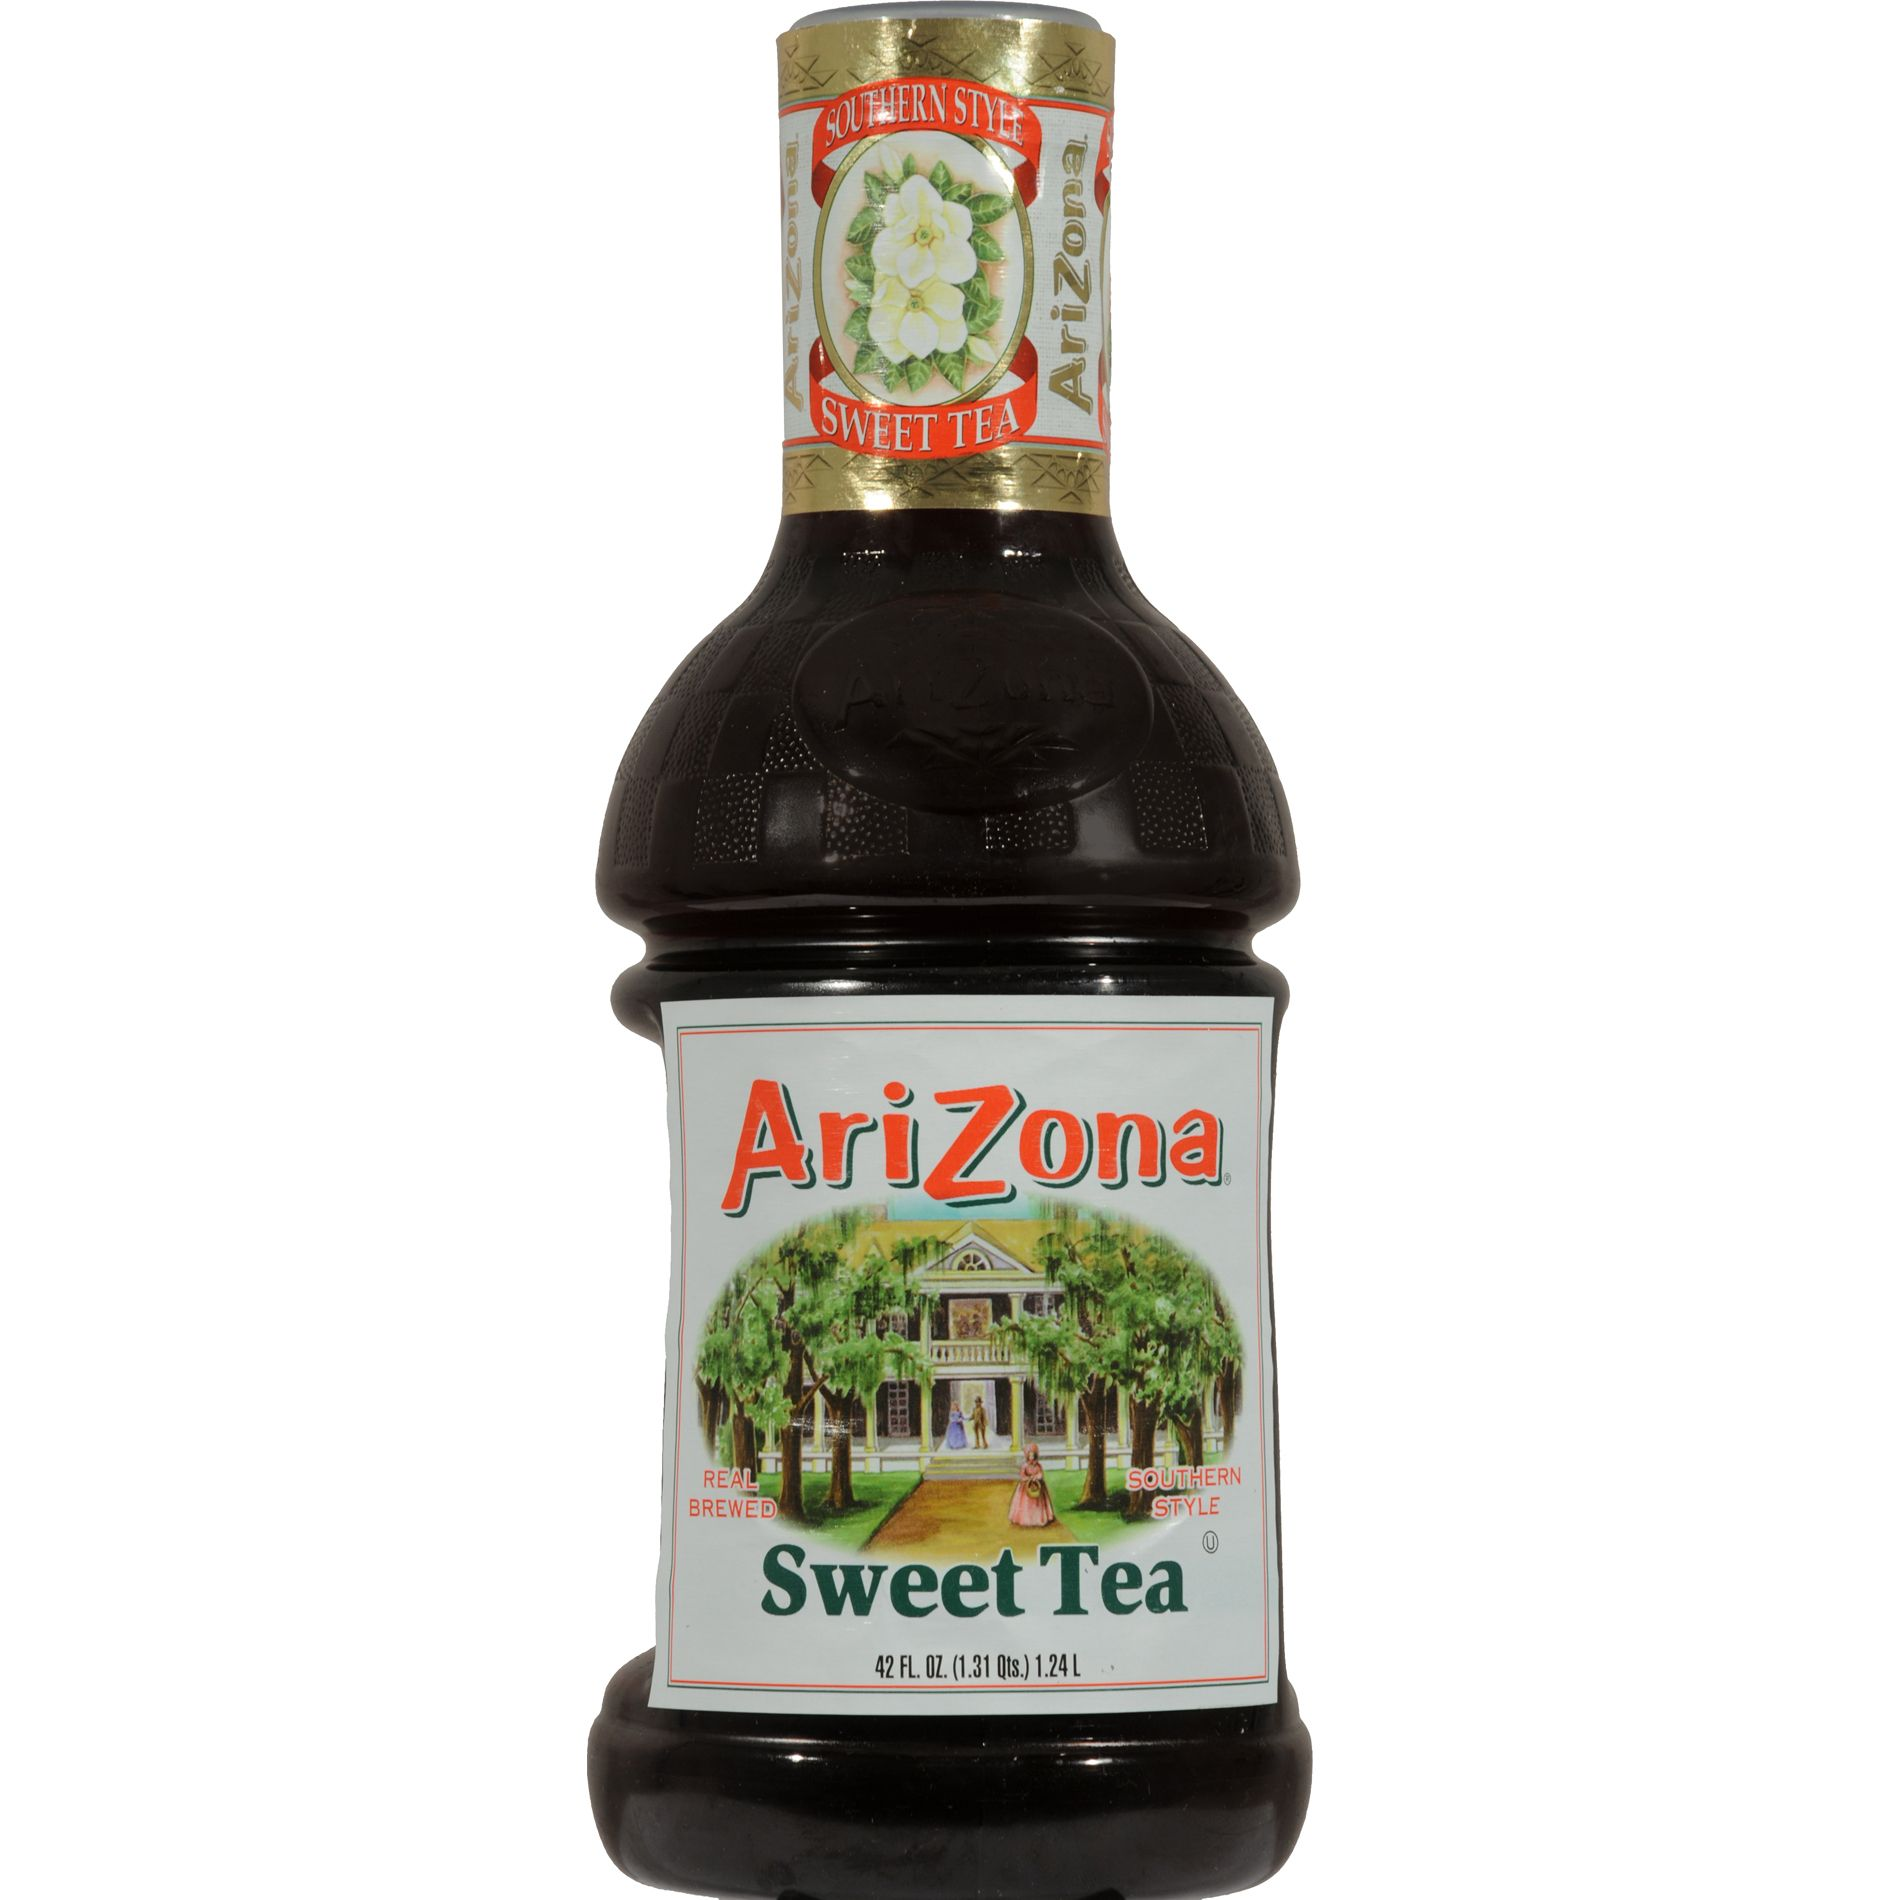 Arizona Sweet Tea Pet Grip 42 Fl Oz